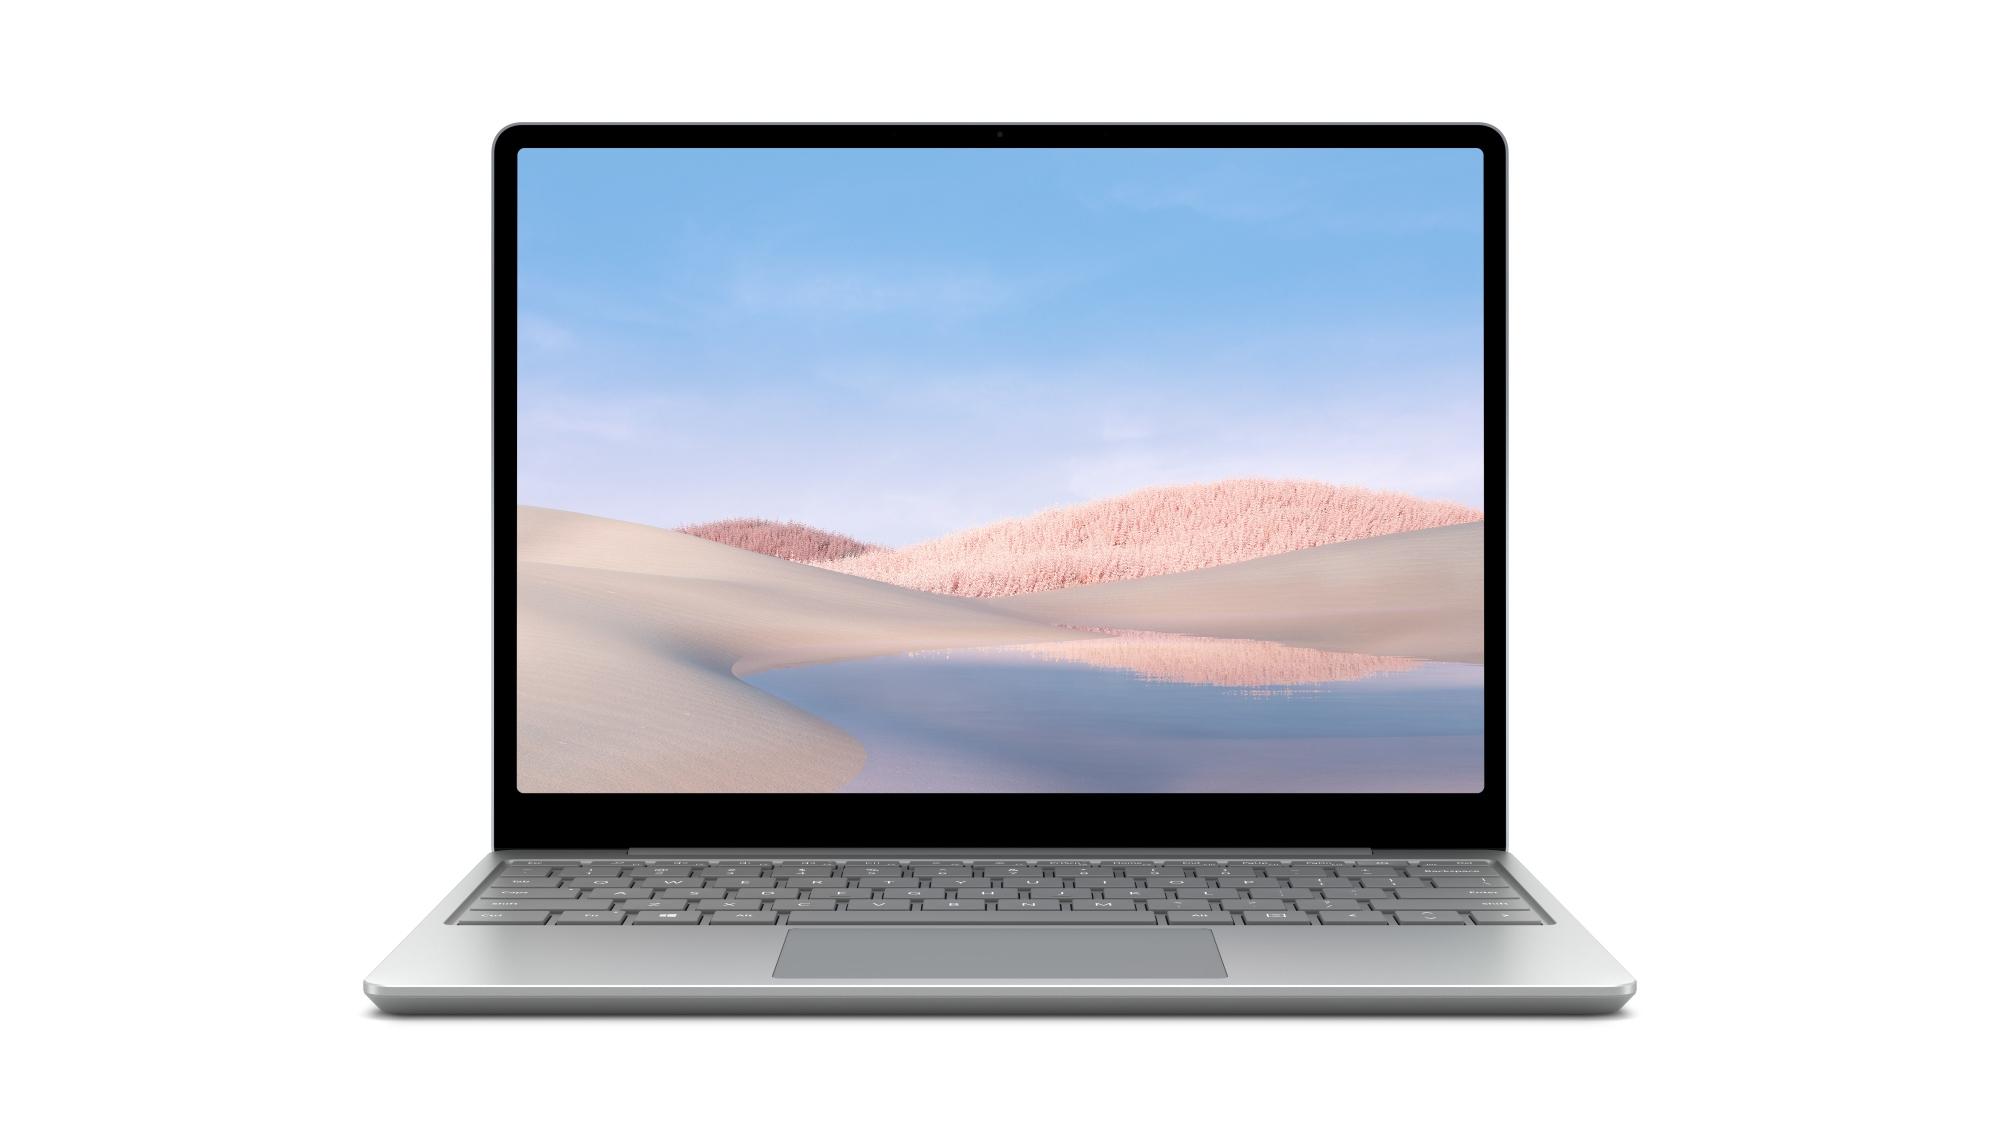 Surface Laptop Go Lpddr4x-sdram Portátil 31,6 Cm (12.4) 1536 X 1024 Pixeles Pantalla Táctil Intel® Core™ I5 De 10ma Generación 4 Gb 64 Gb Emmc Wi-fi 6 (802.11ax) Windows 10 Home S Platino